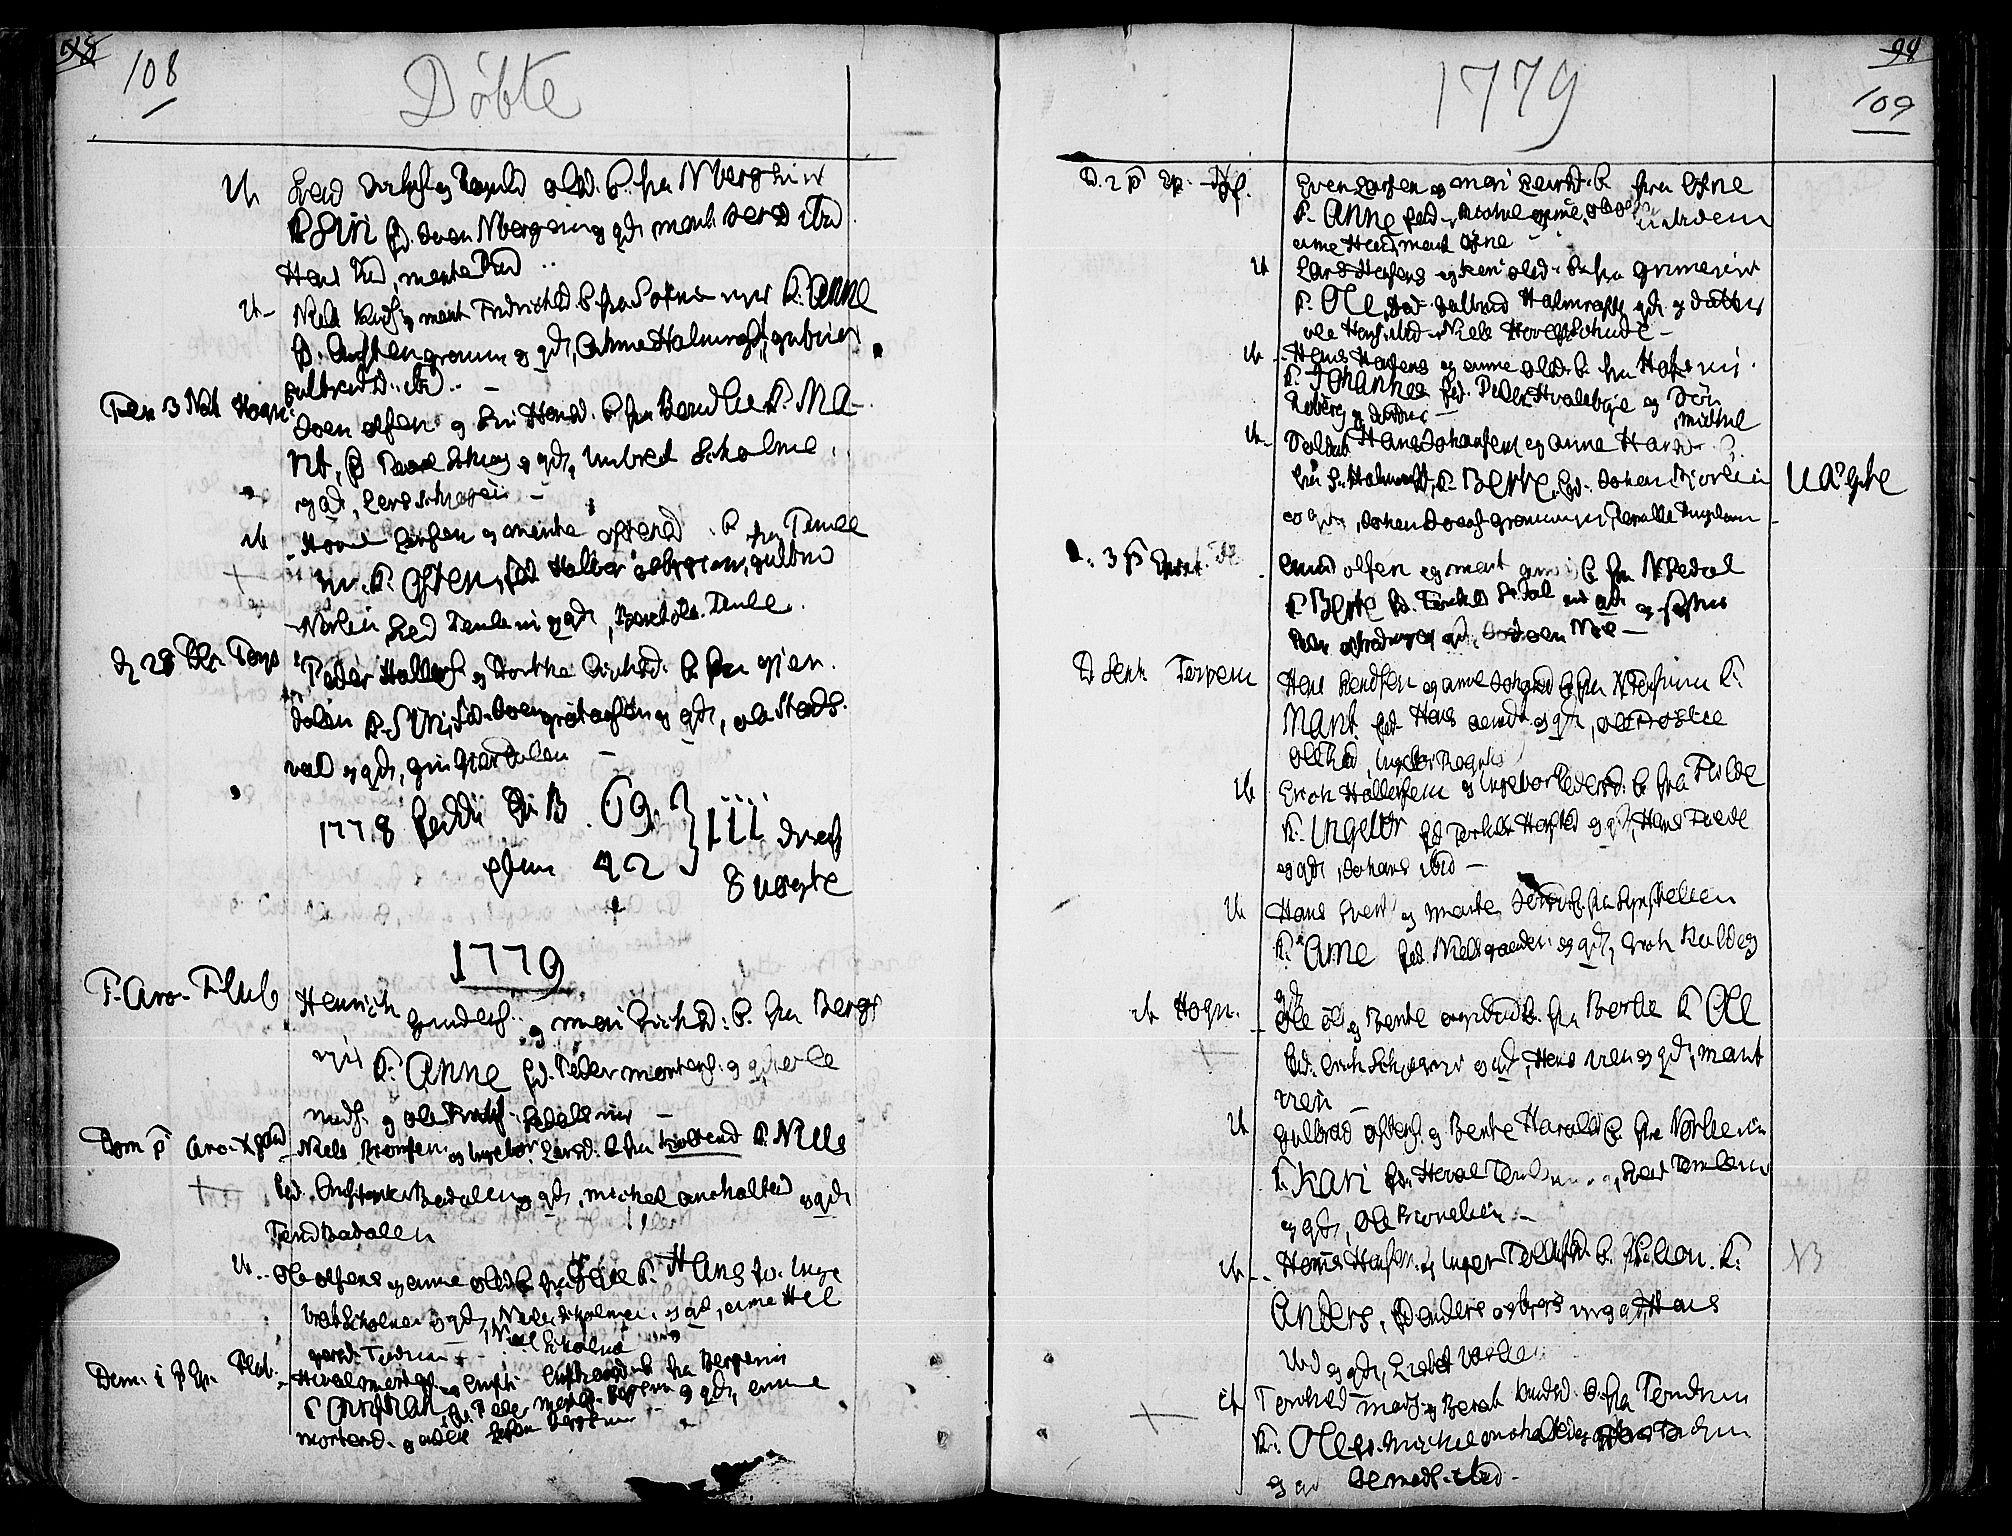 SAH, Land prestekontor, Ministerialbok nr. 5, 1765-1784, s. 108-109